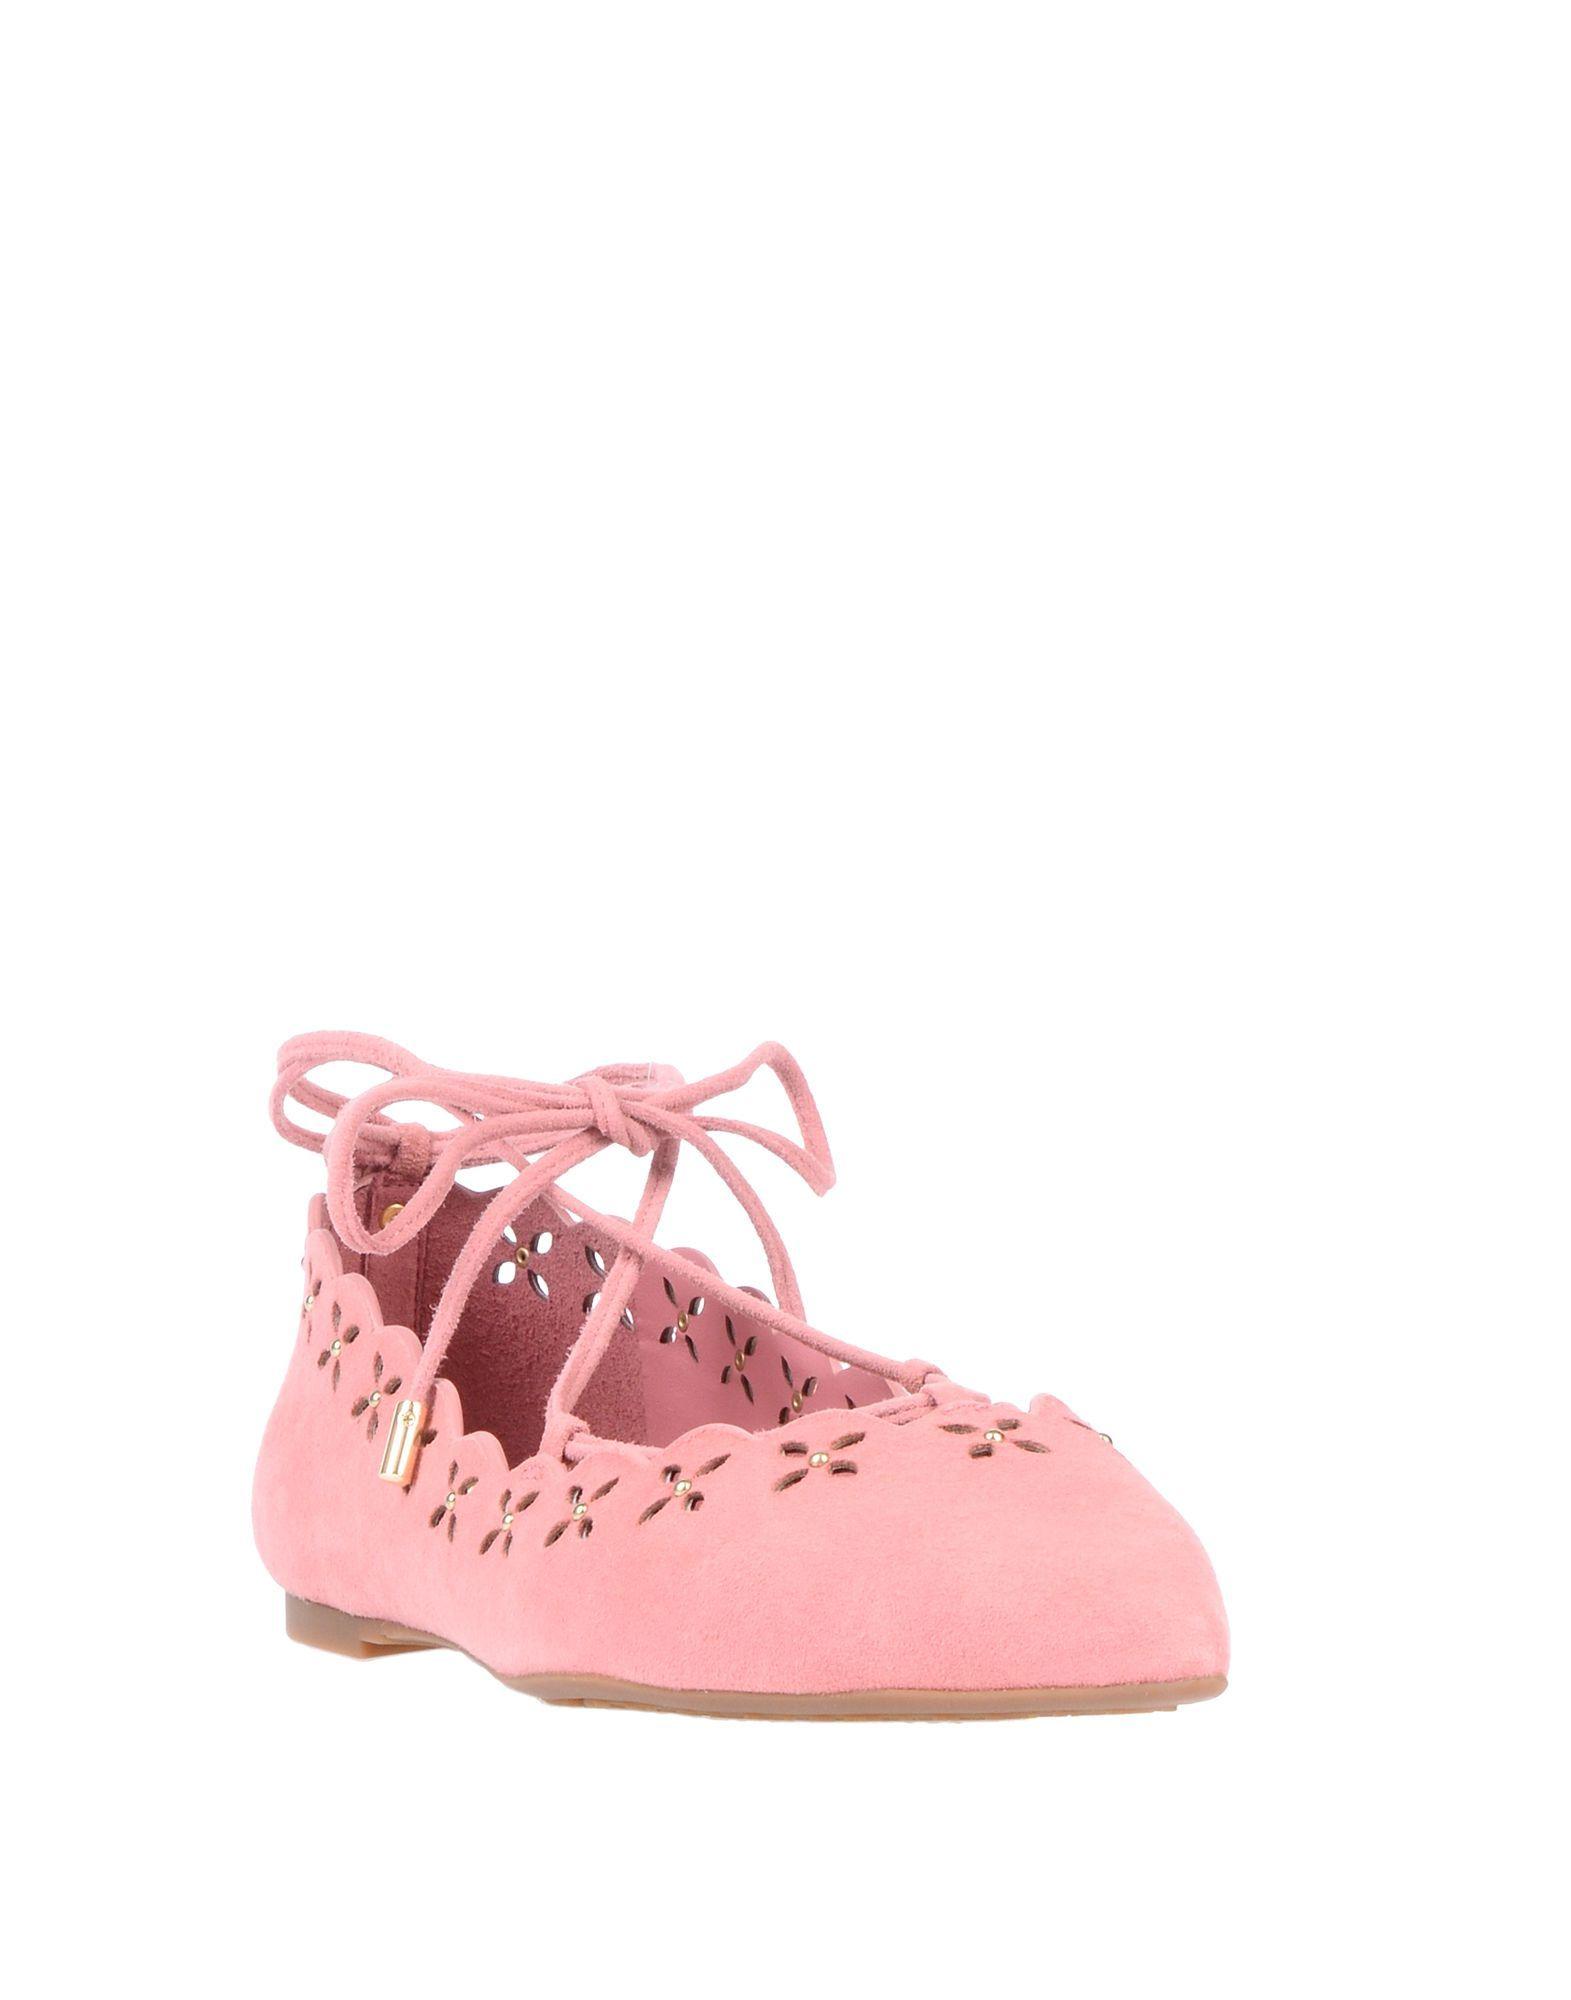 Footwear Michael Michael Kors Pastel Pink Women's Leather